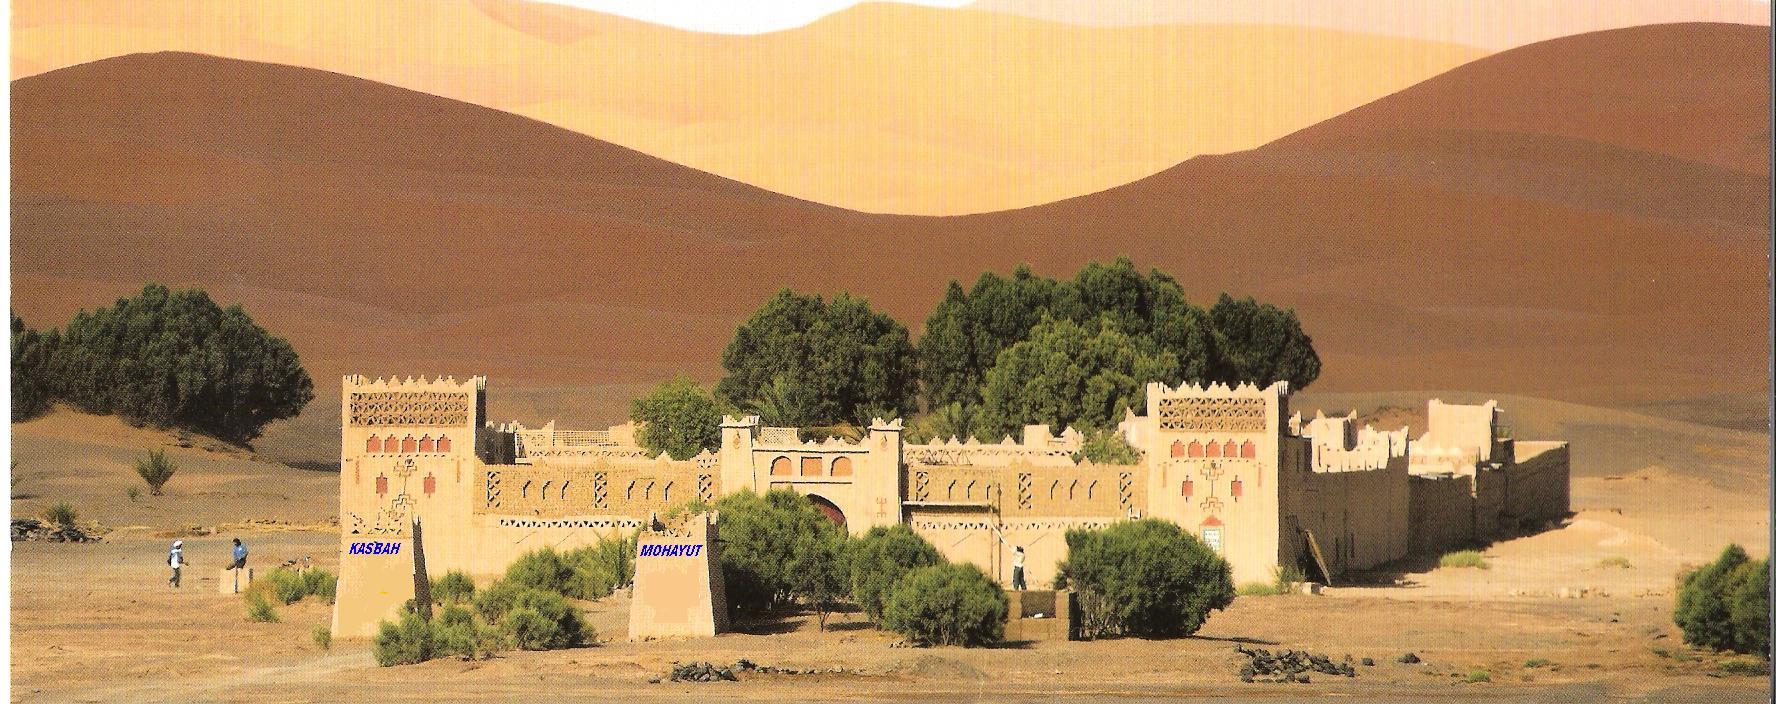 Kasbah Hotel Hotels Merzouga Kasbah